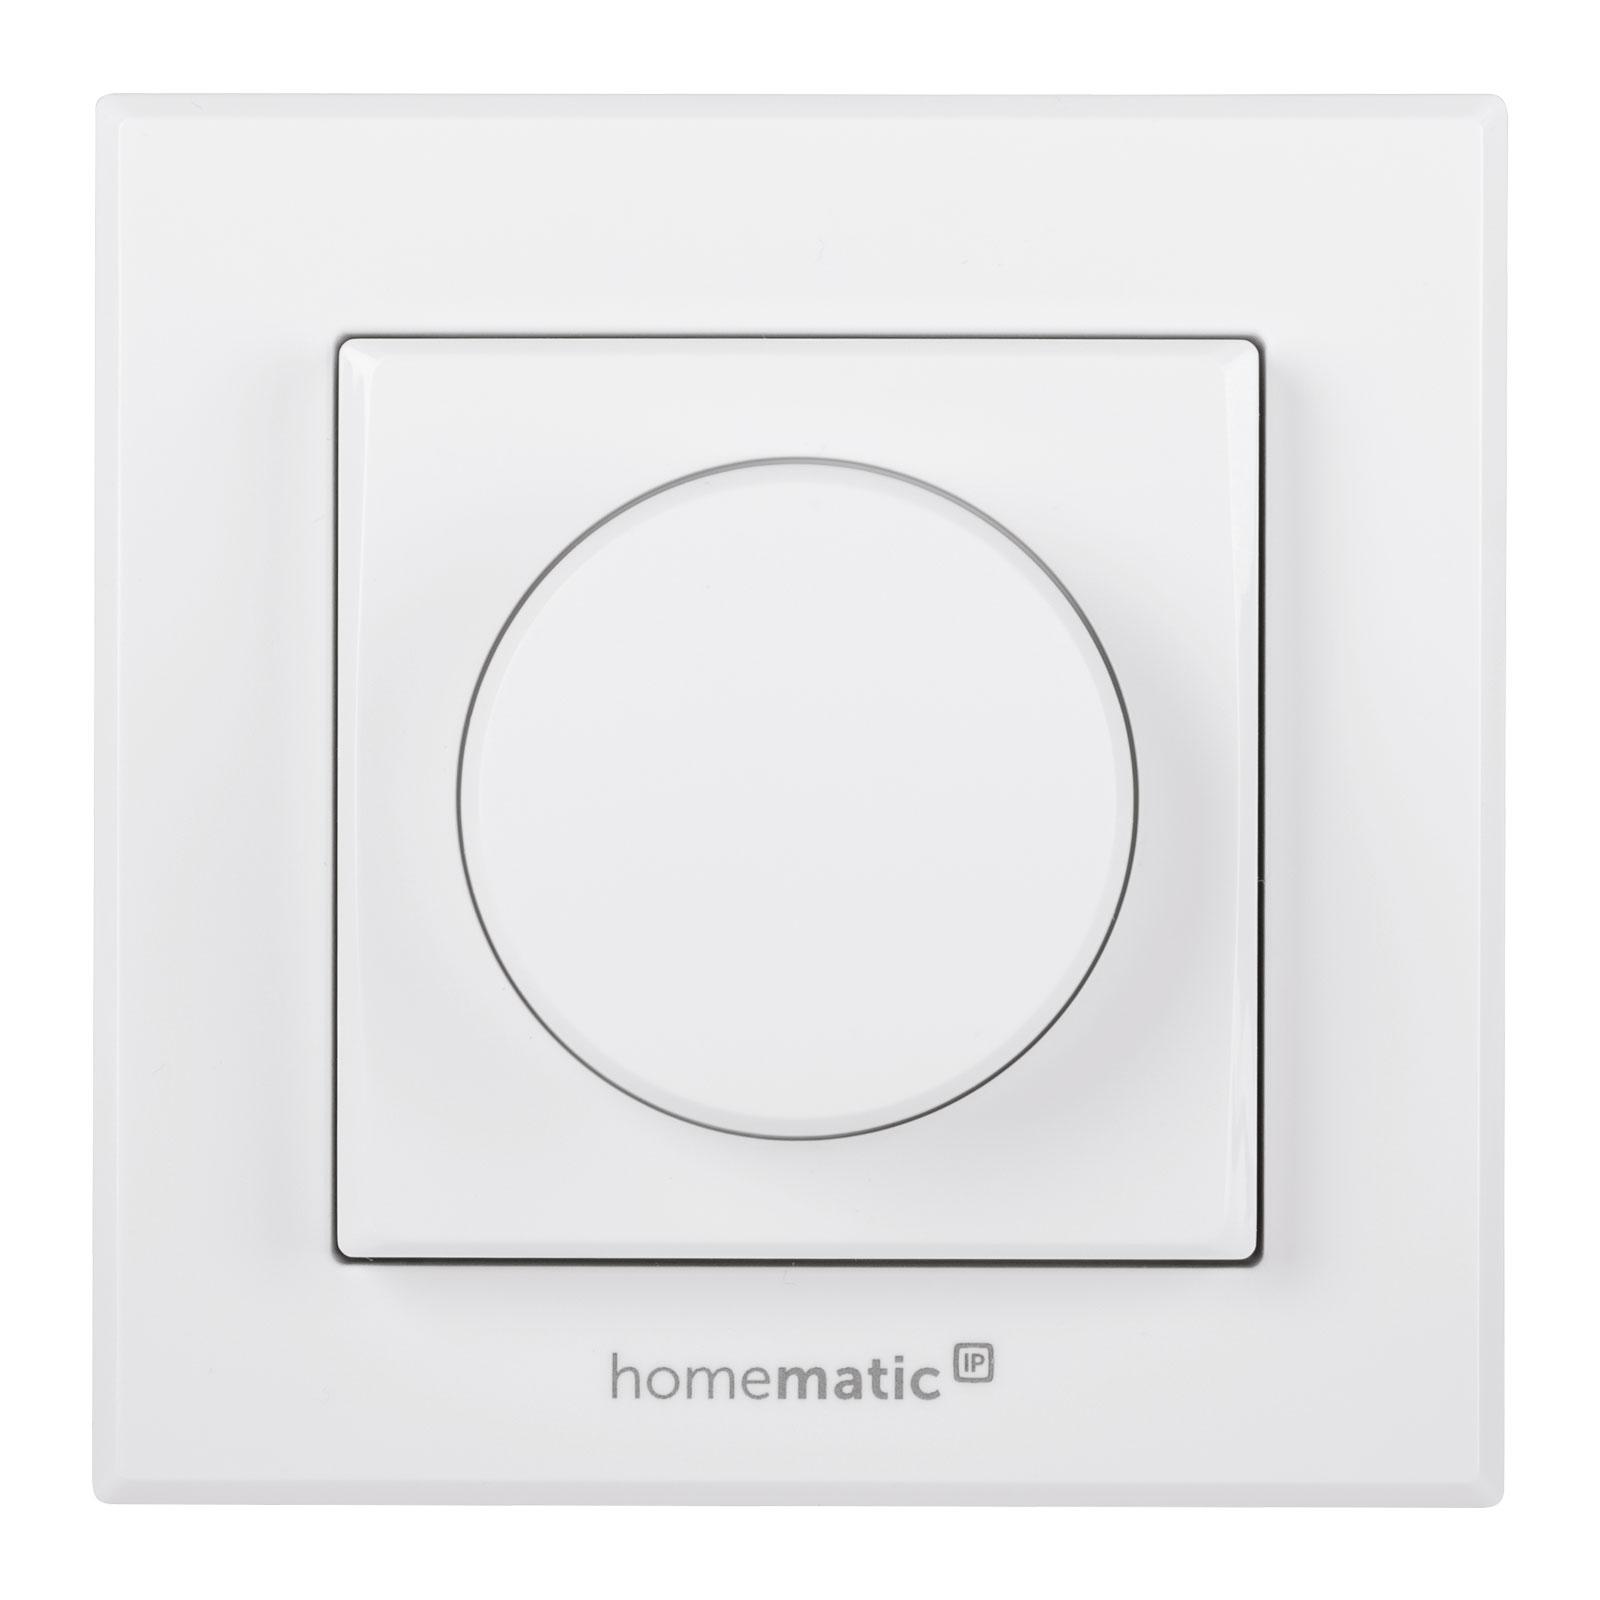 Homematic IP bouton curseur